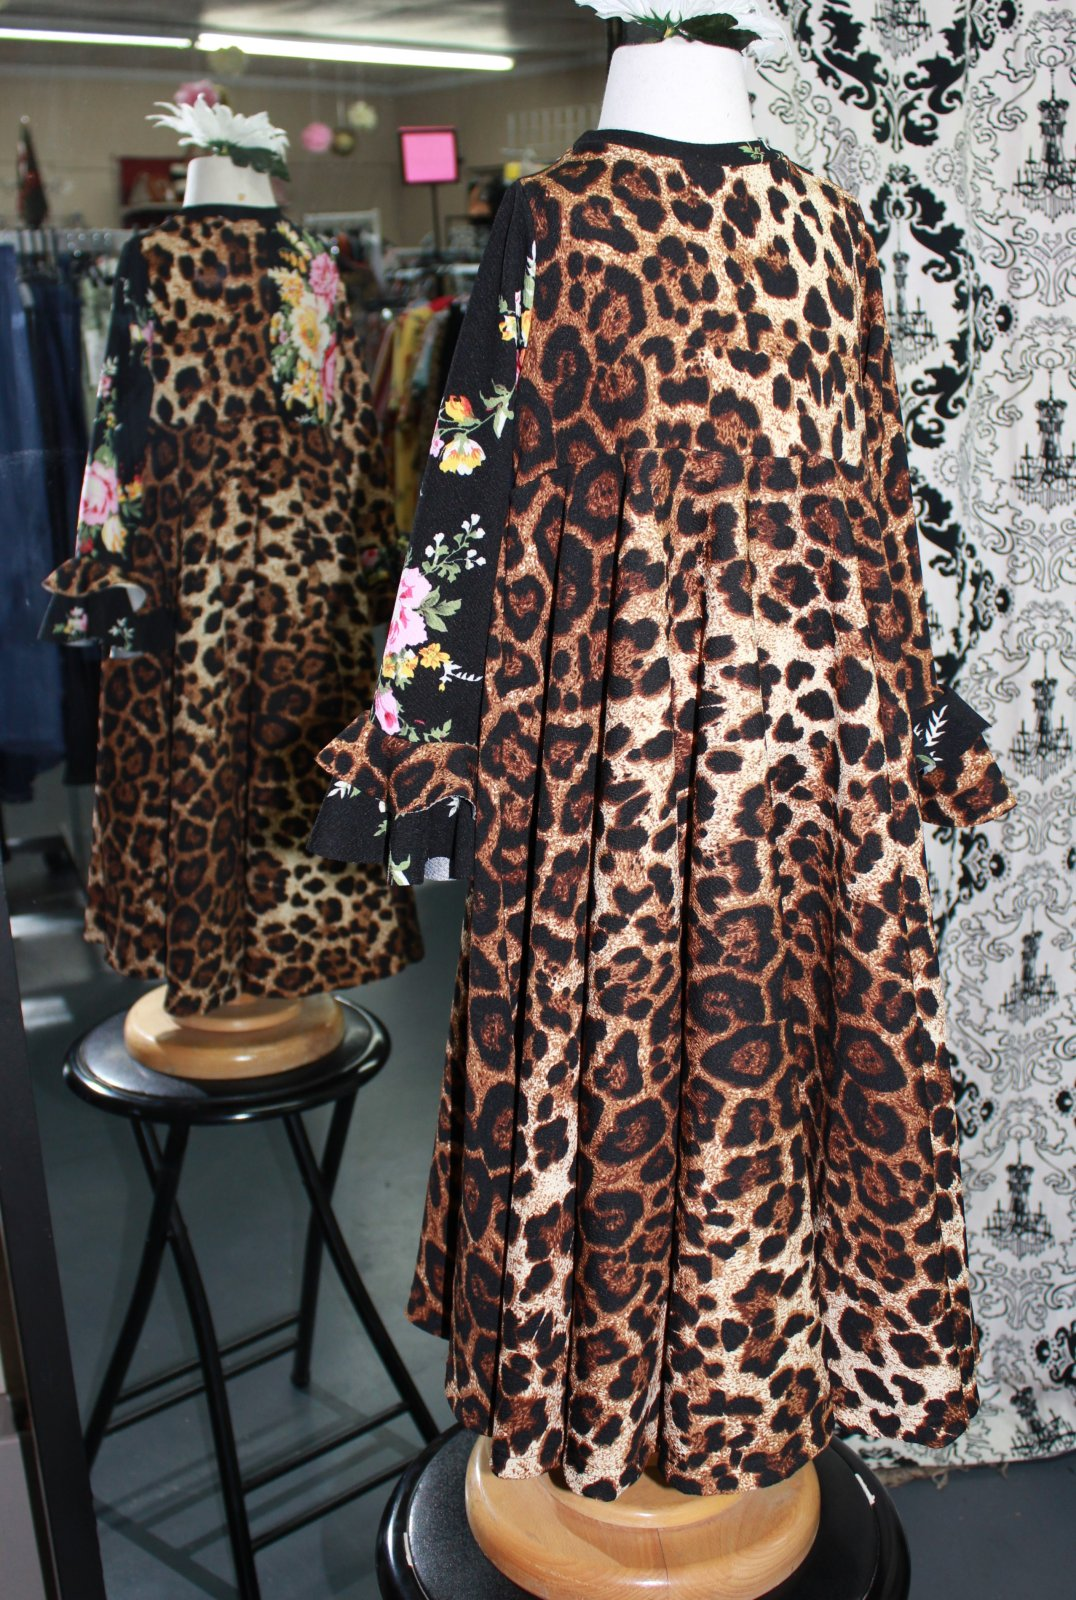 Girls Leopard & Floral Dress Bows in Blush